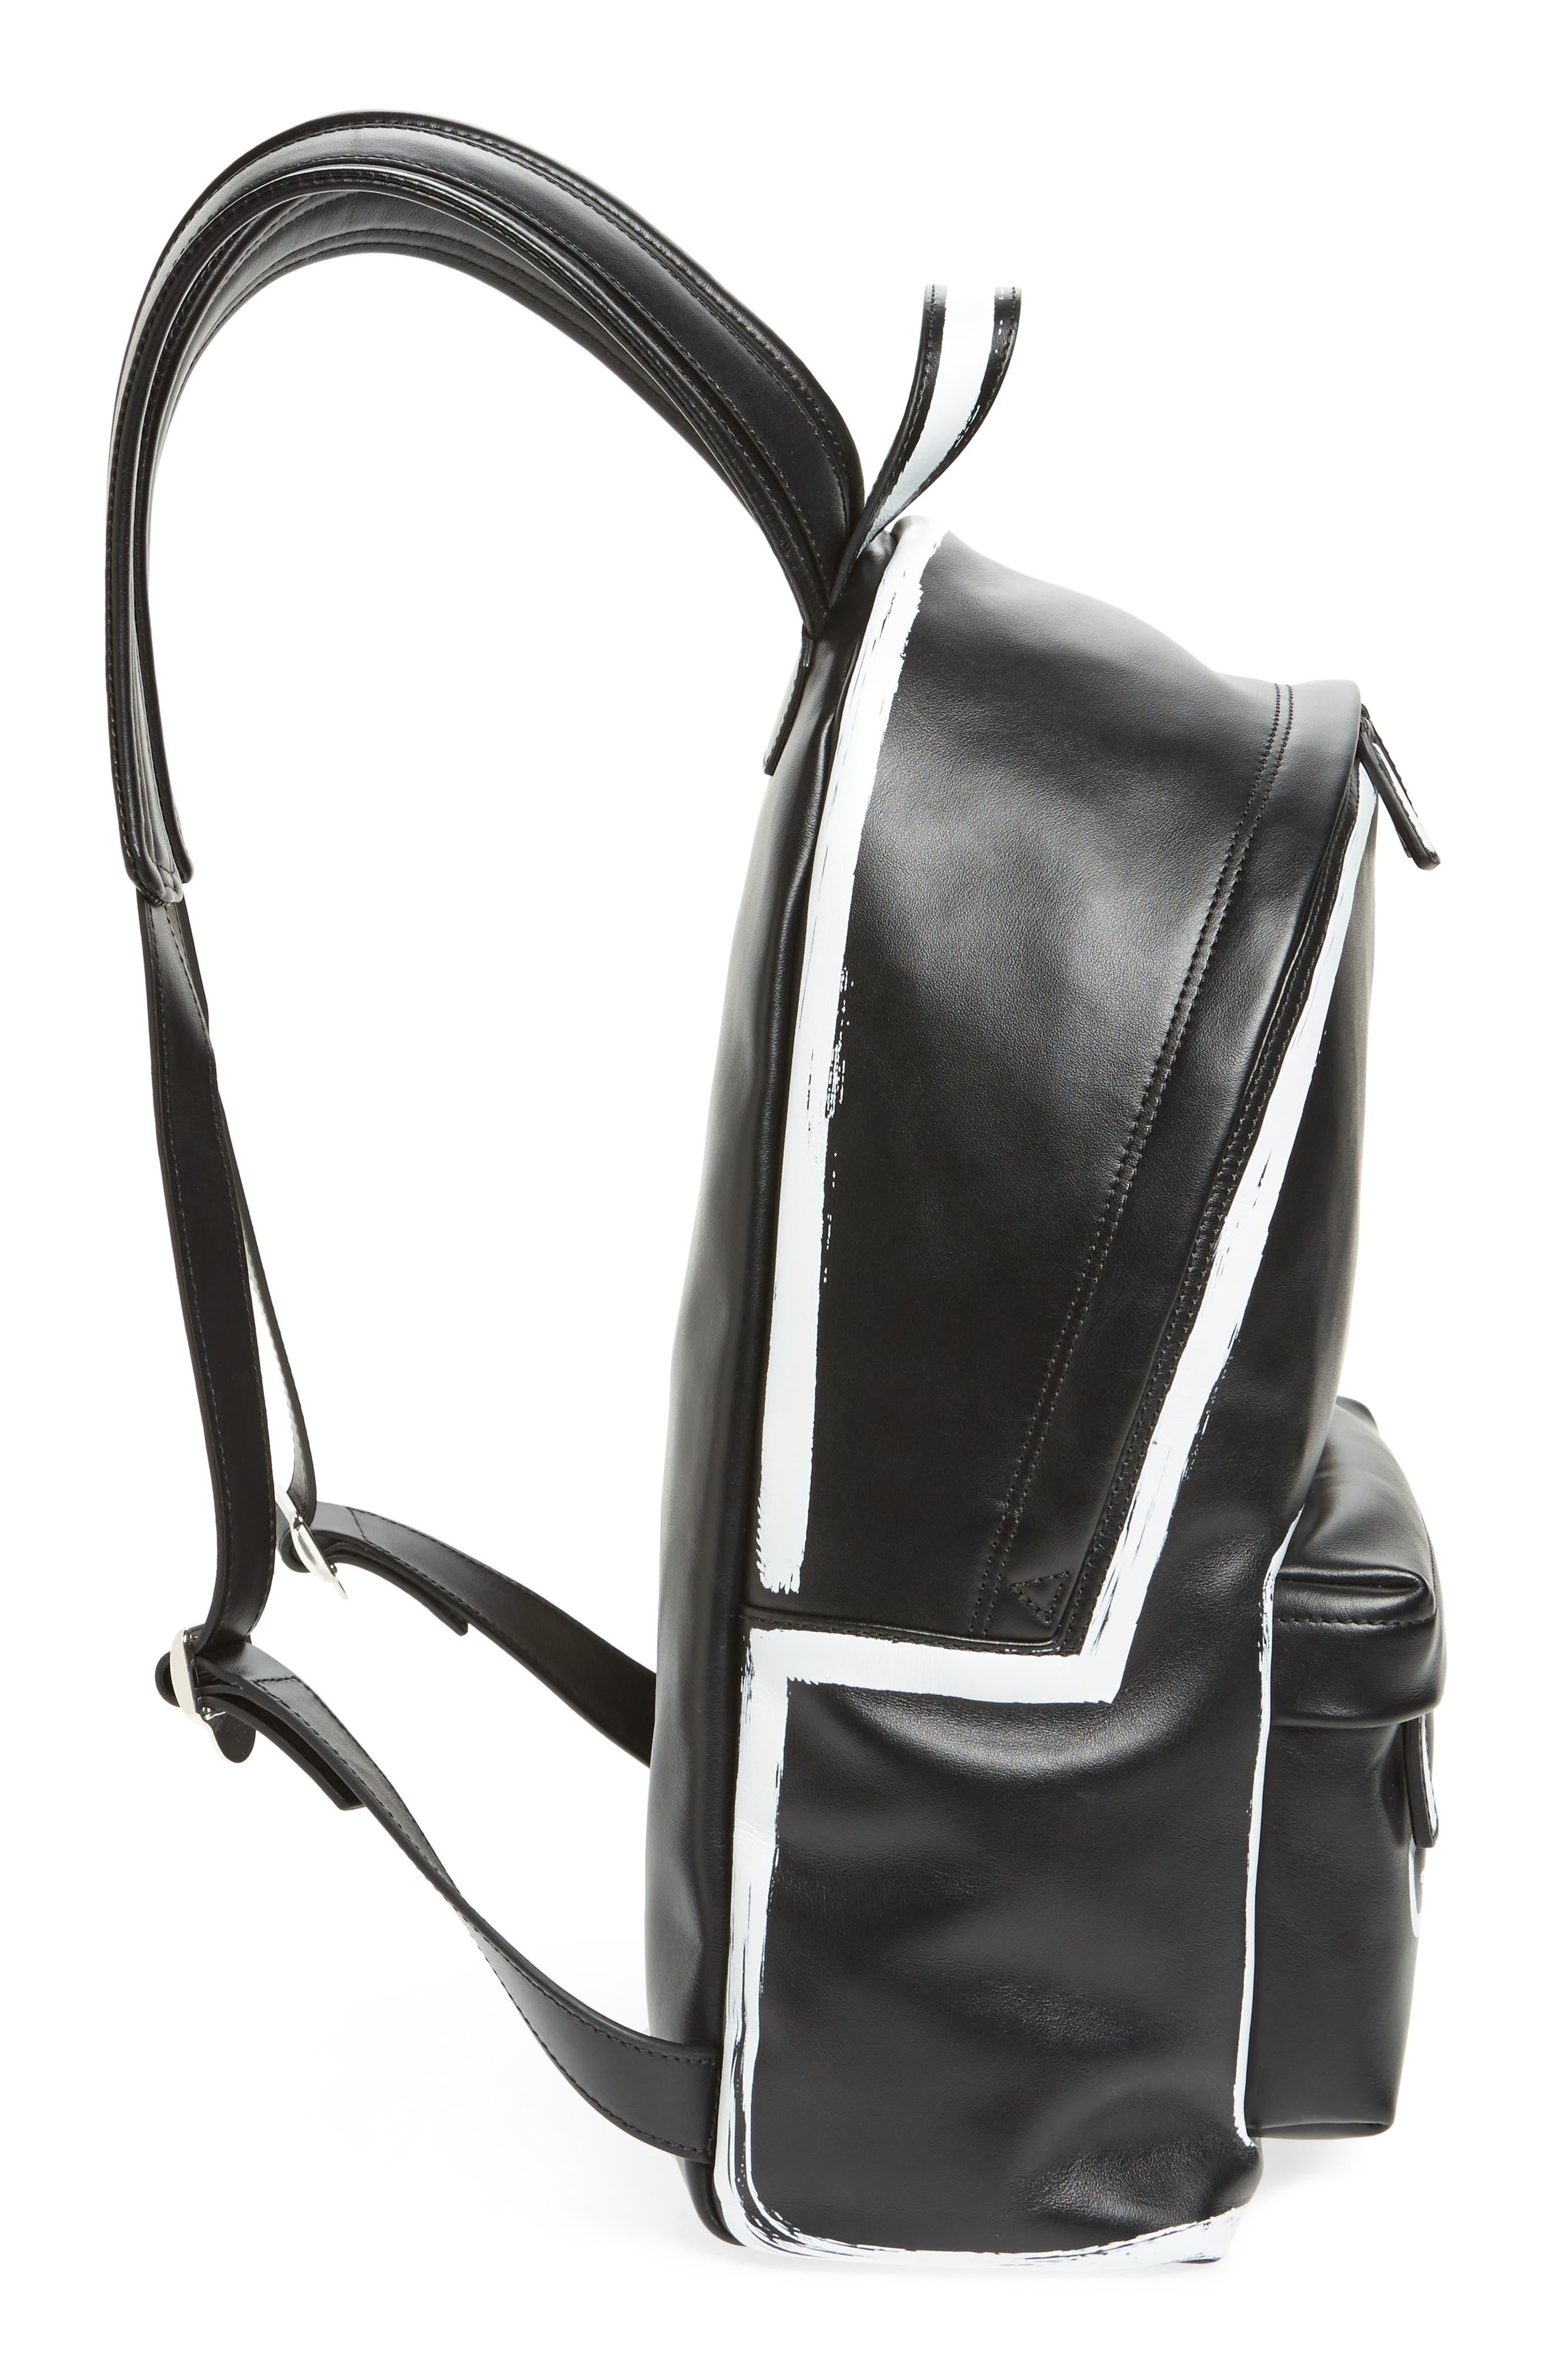 Graffiti Calfskin Leather Backpack,                             Alternate thumbnail 5, color,                             001